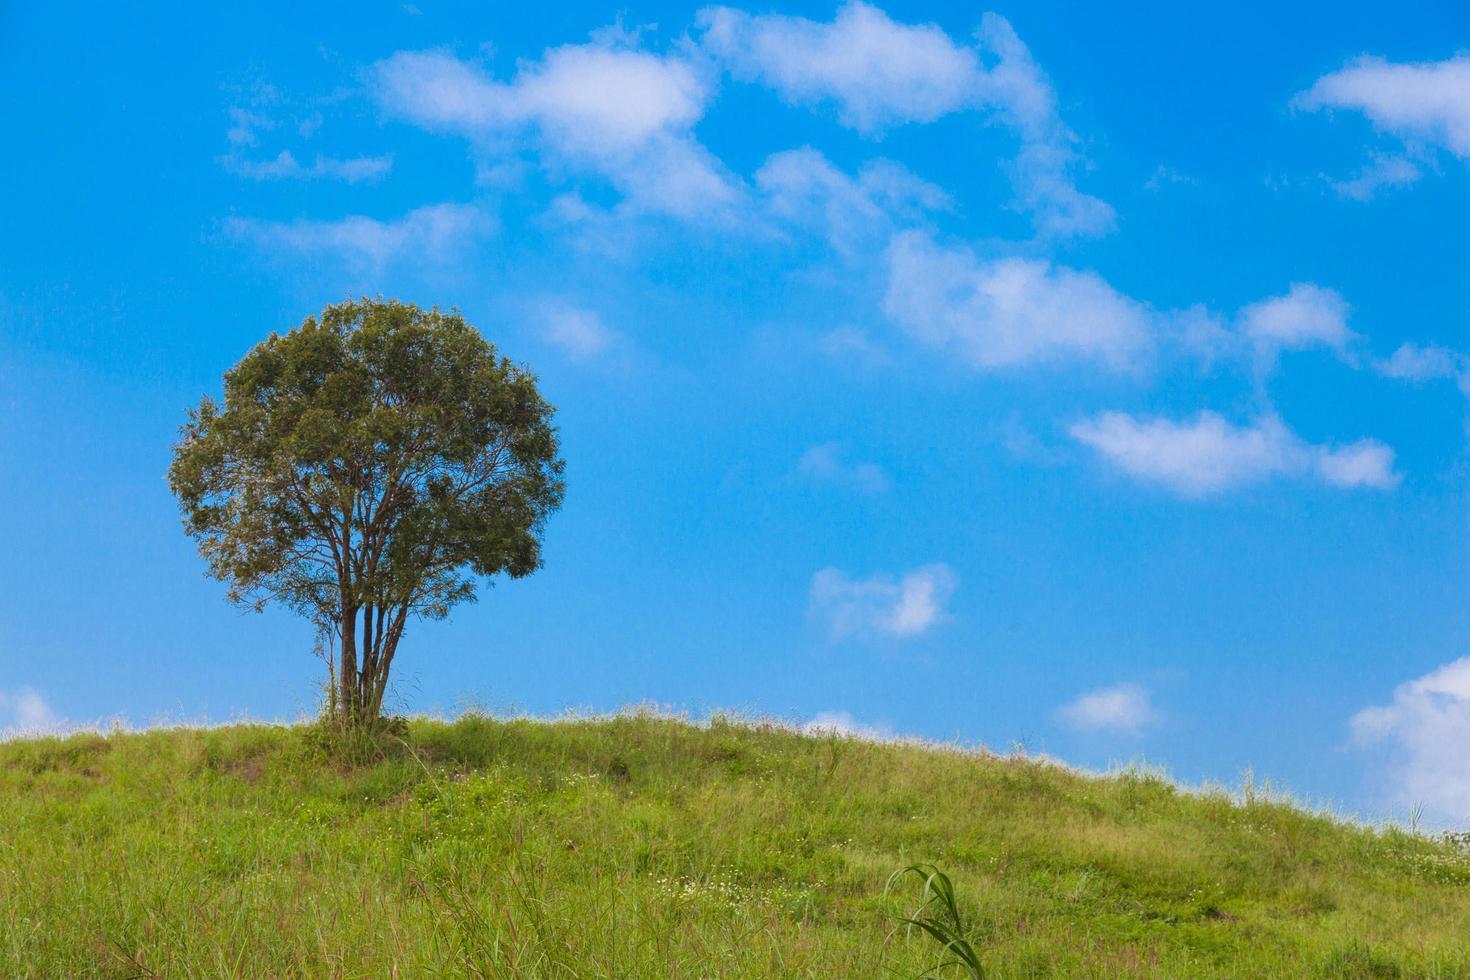 Baum auf dem Hügel foto